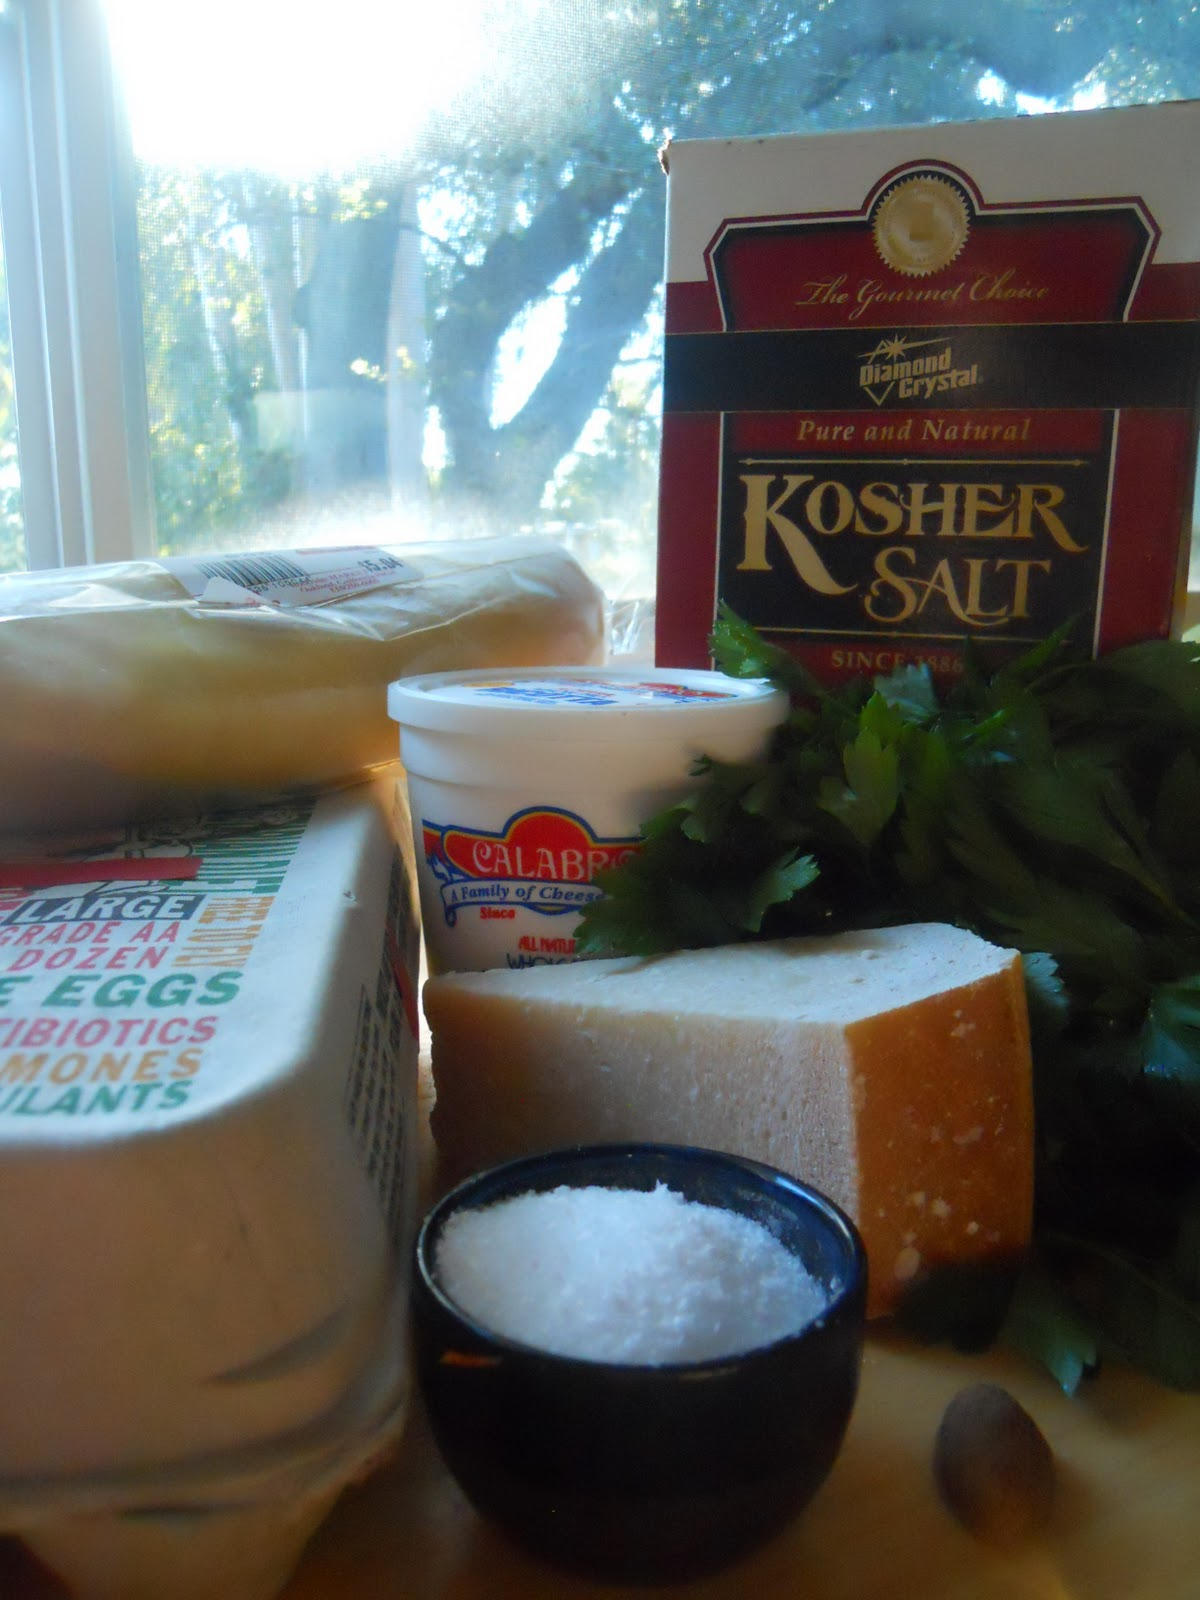 morsels & sauces: November 2010